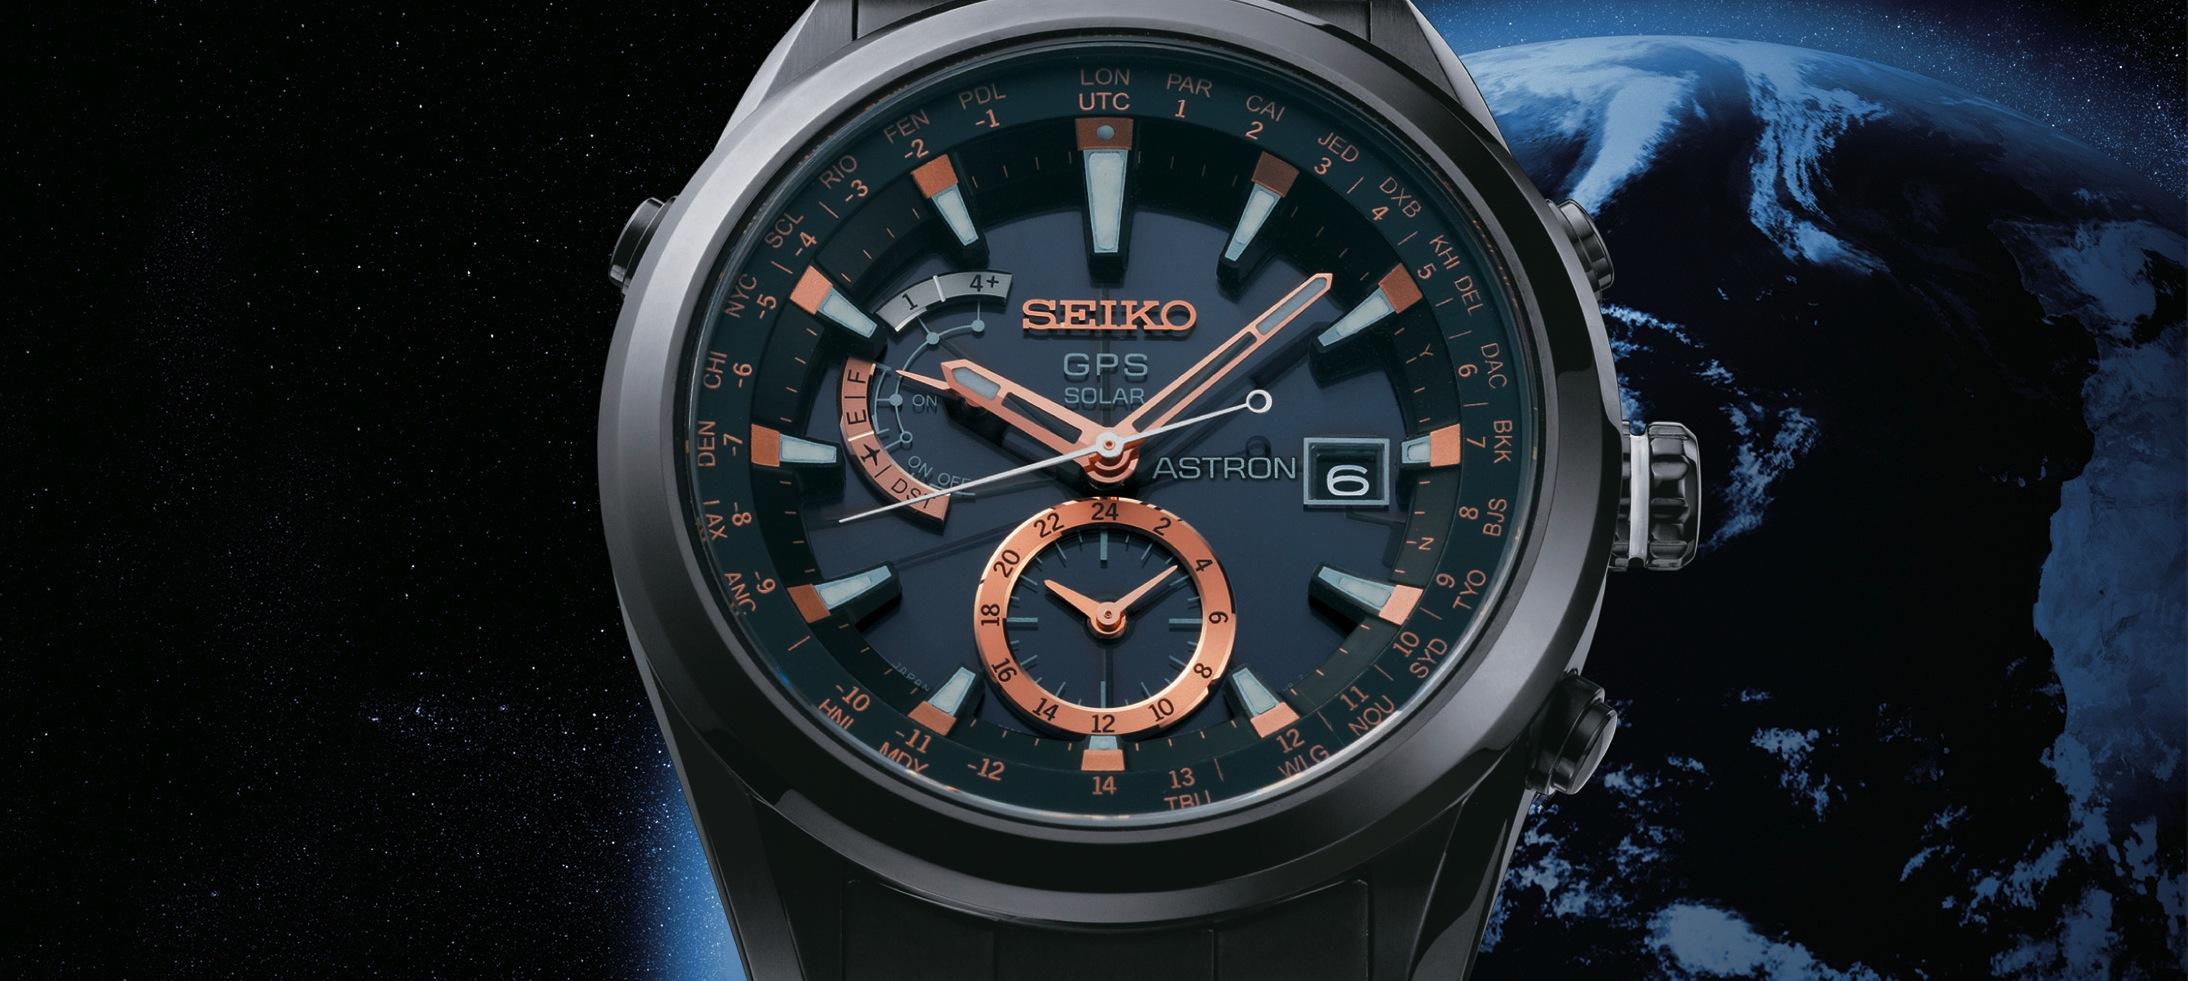 Seiko Astron GPS (Limited Edition)